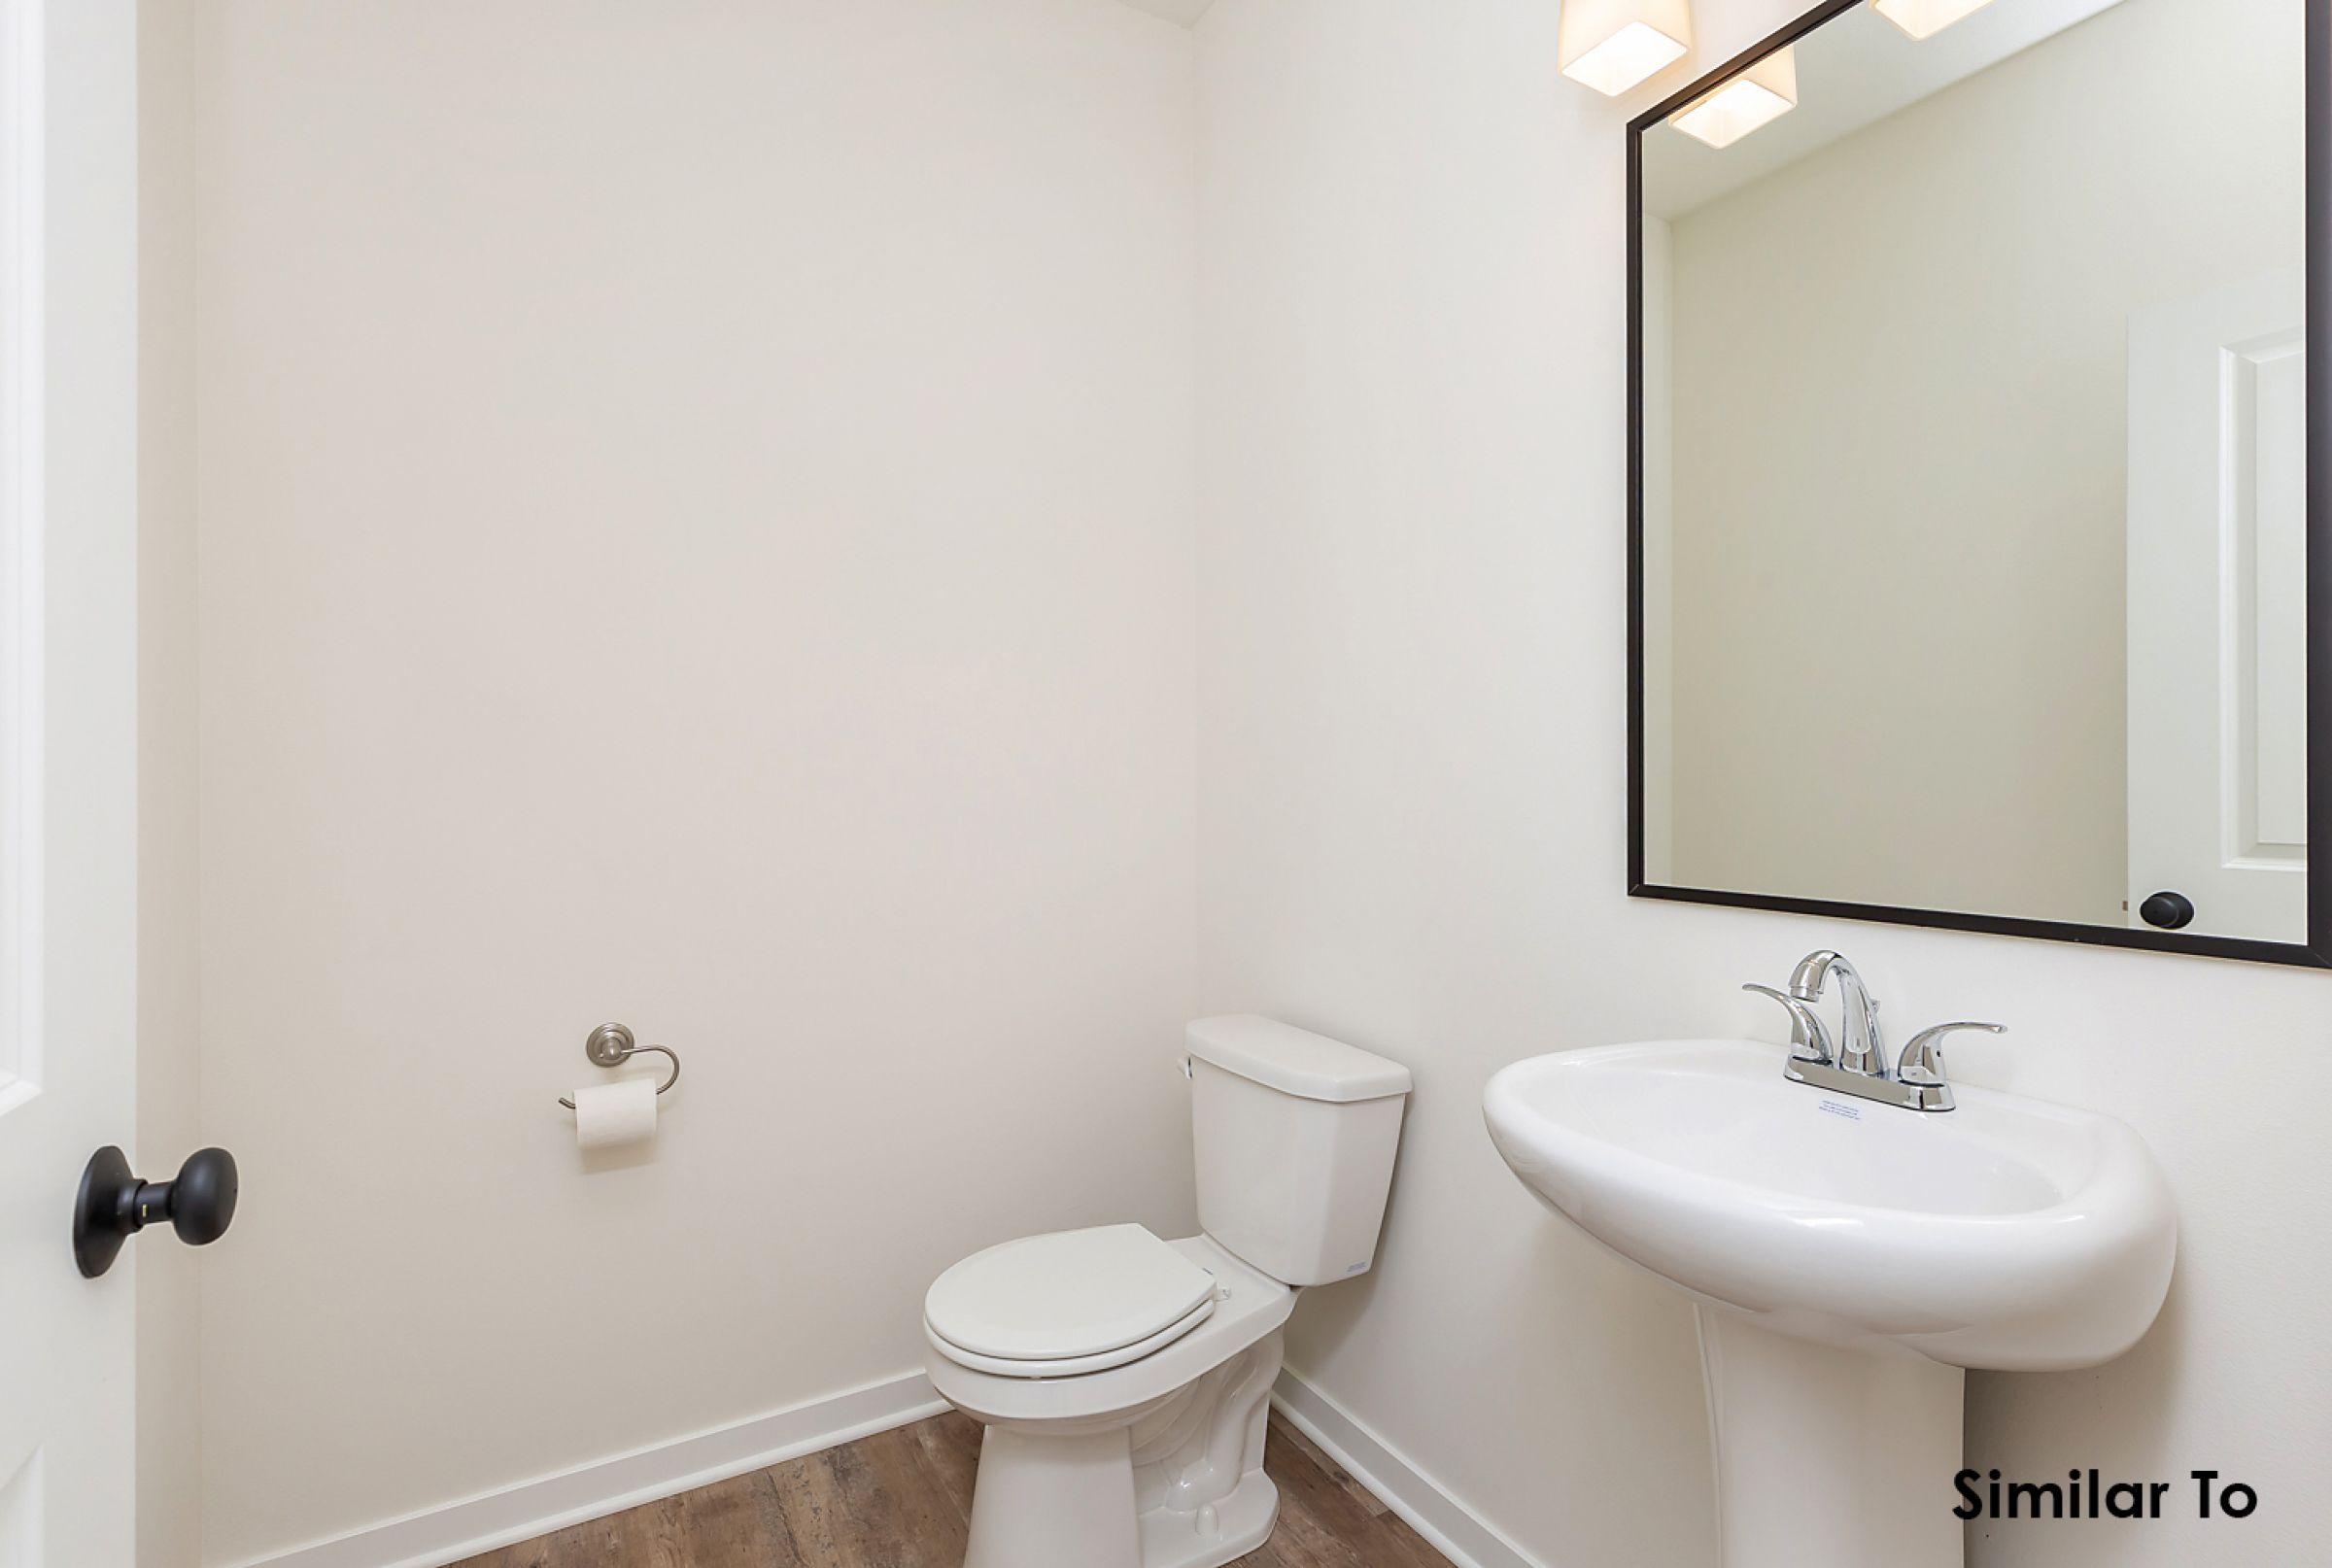 residential-warren-county-iowa-0-acres-listing-number-15138-1-2020-08-28-172748.jpg